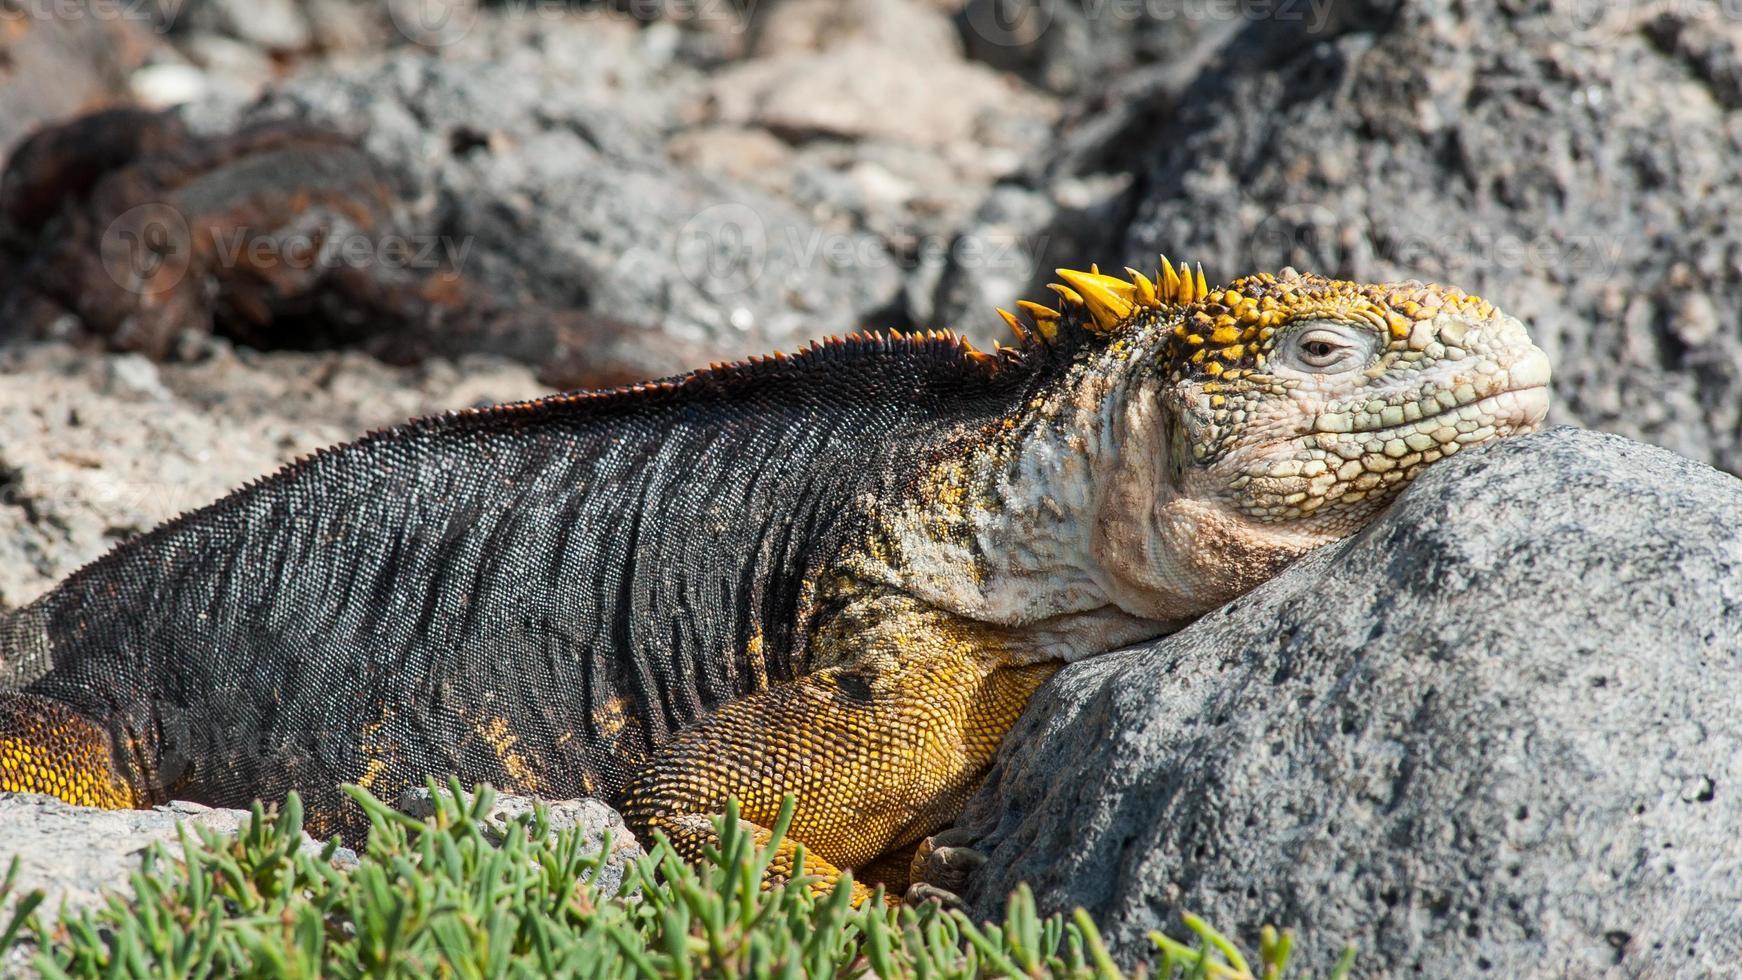 Galapagos Iguana photo